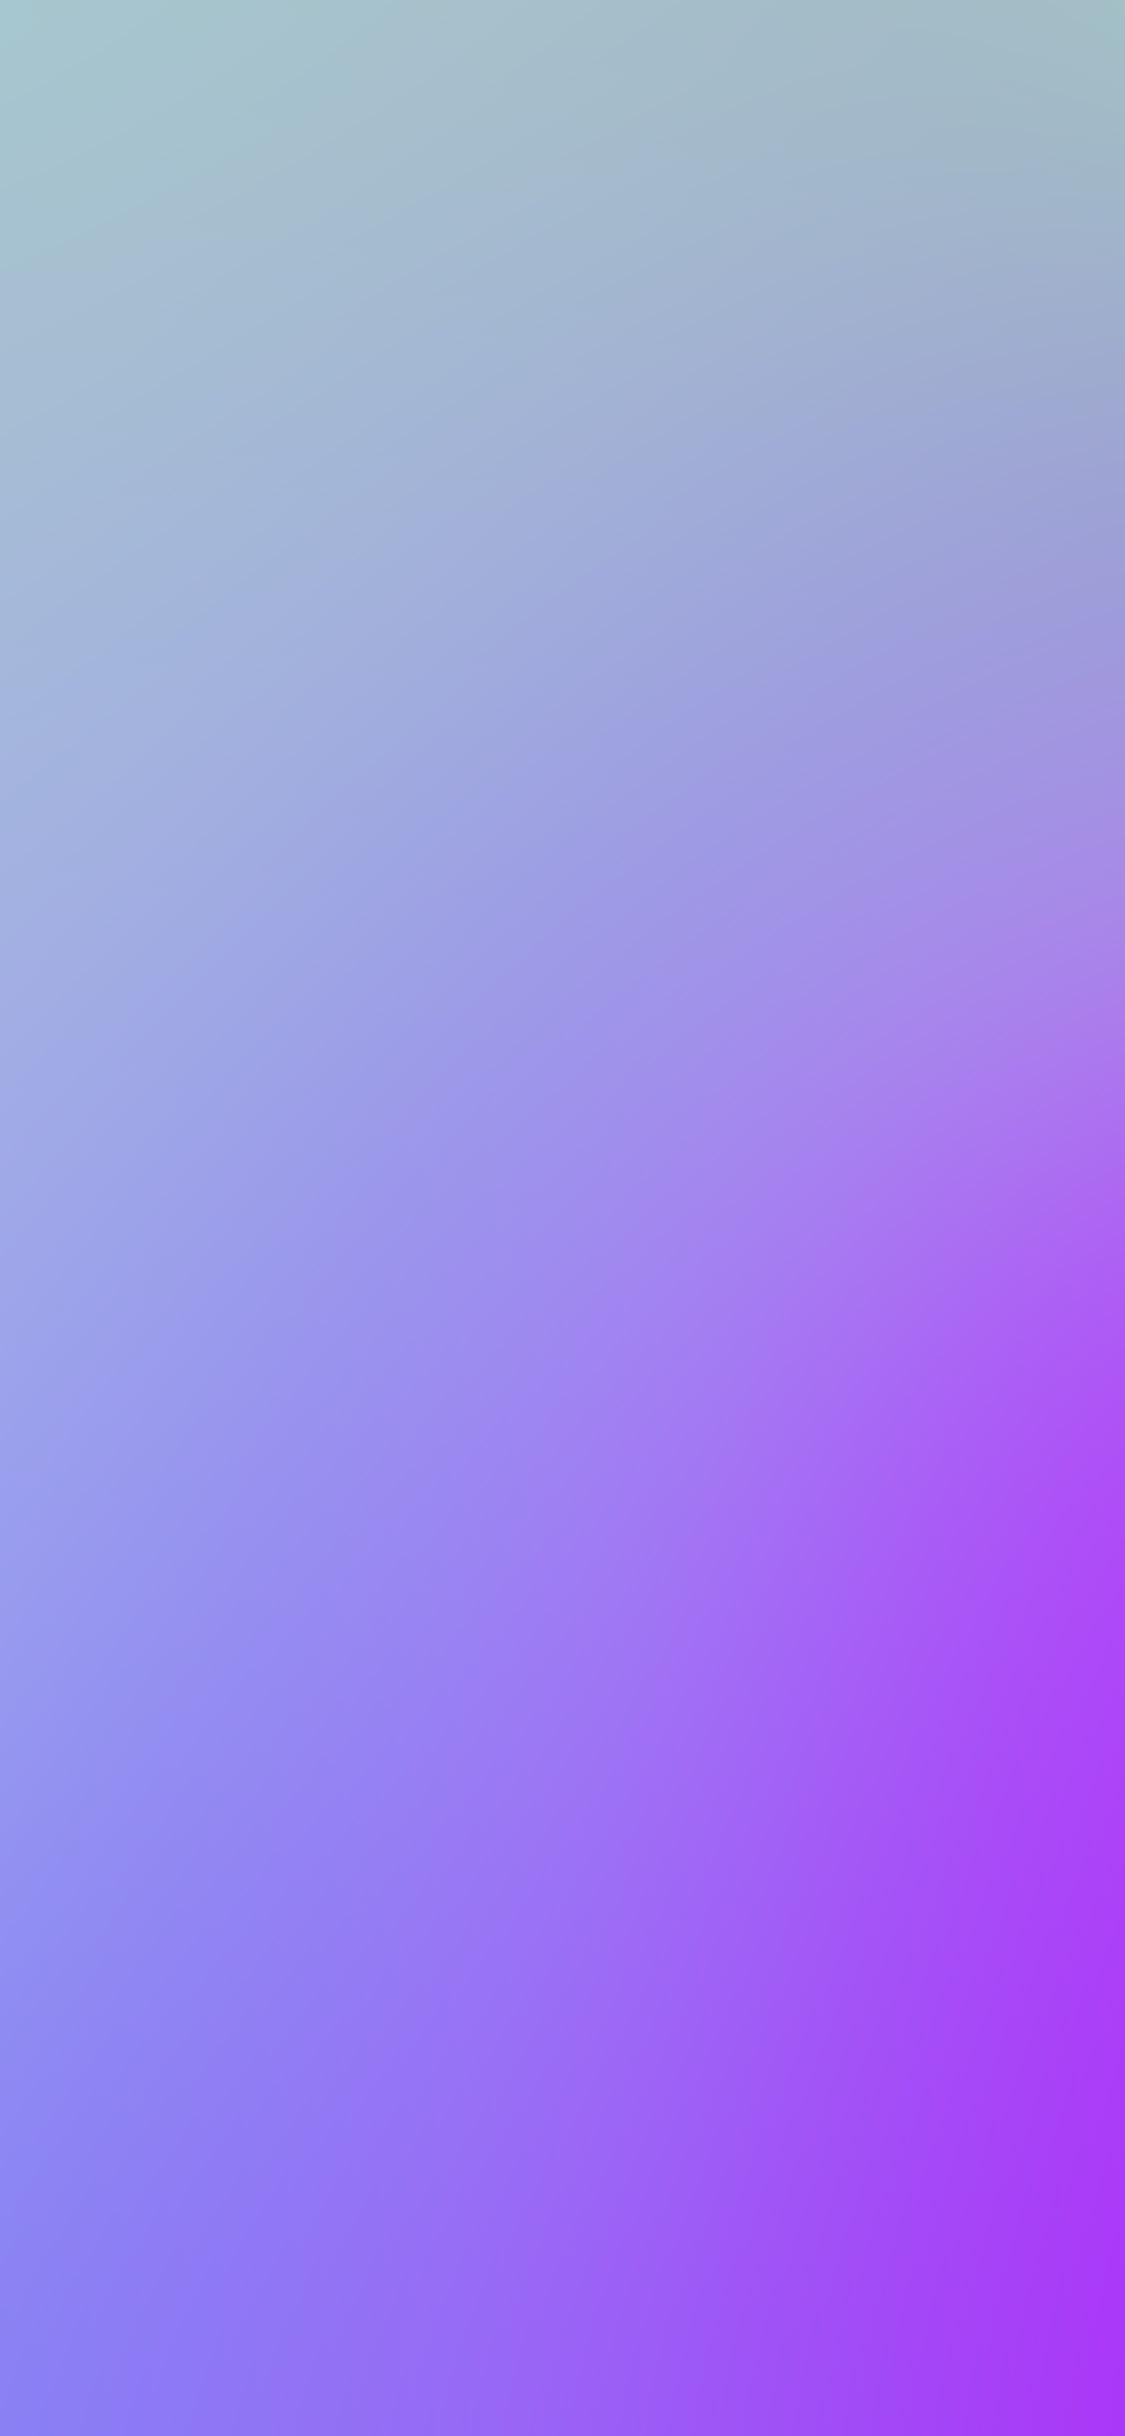 iPhonexpapers.com-Apple-iPhone-wallpaper-so34-blur-gradation-purple